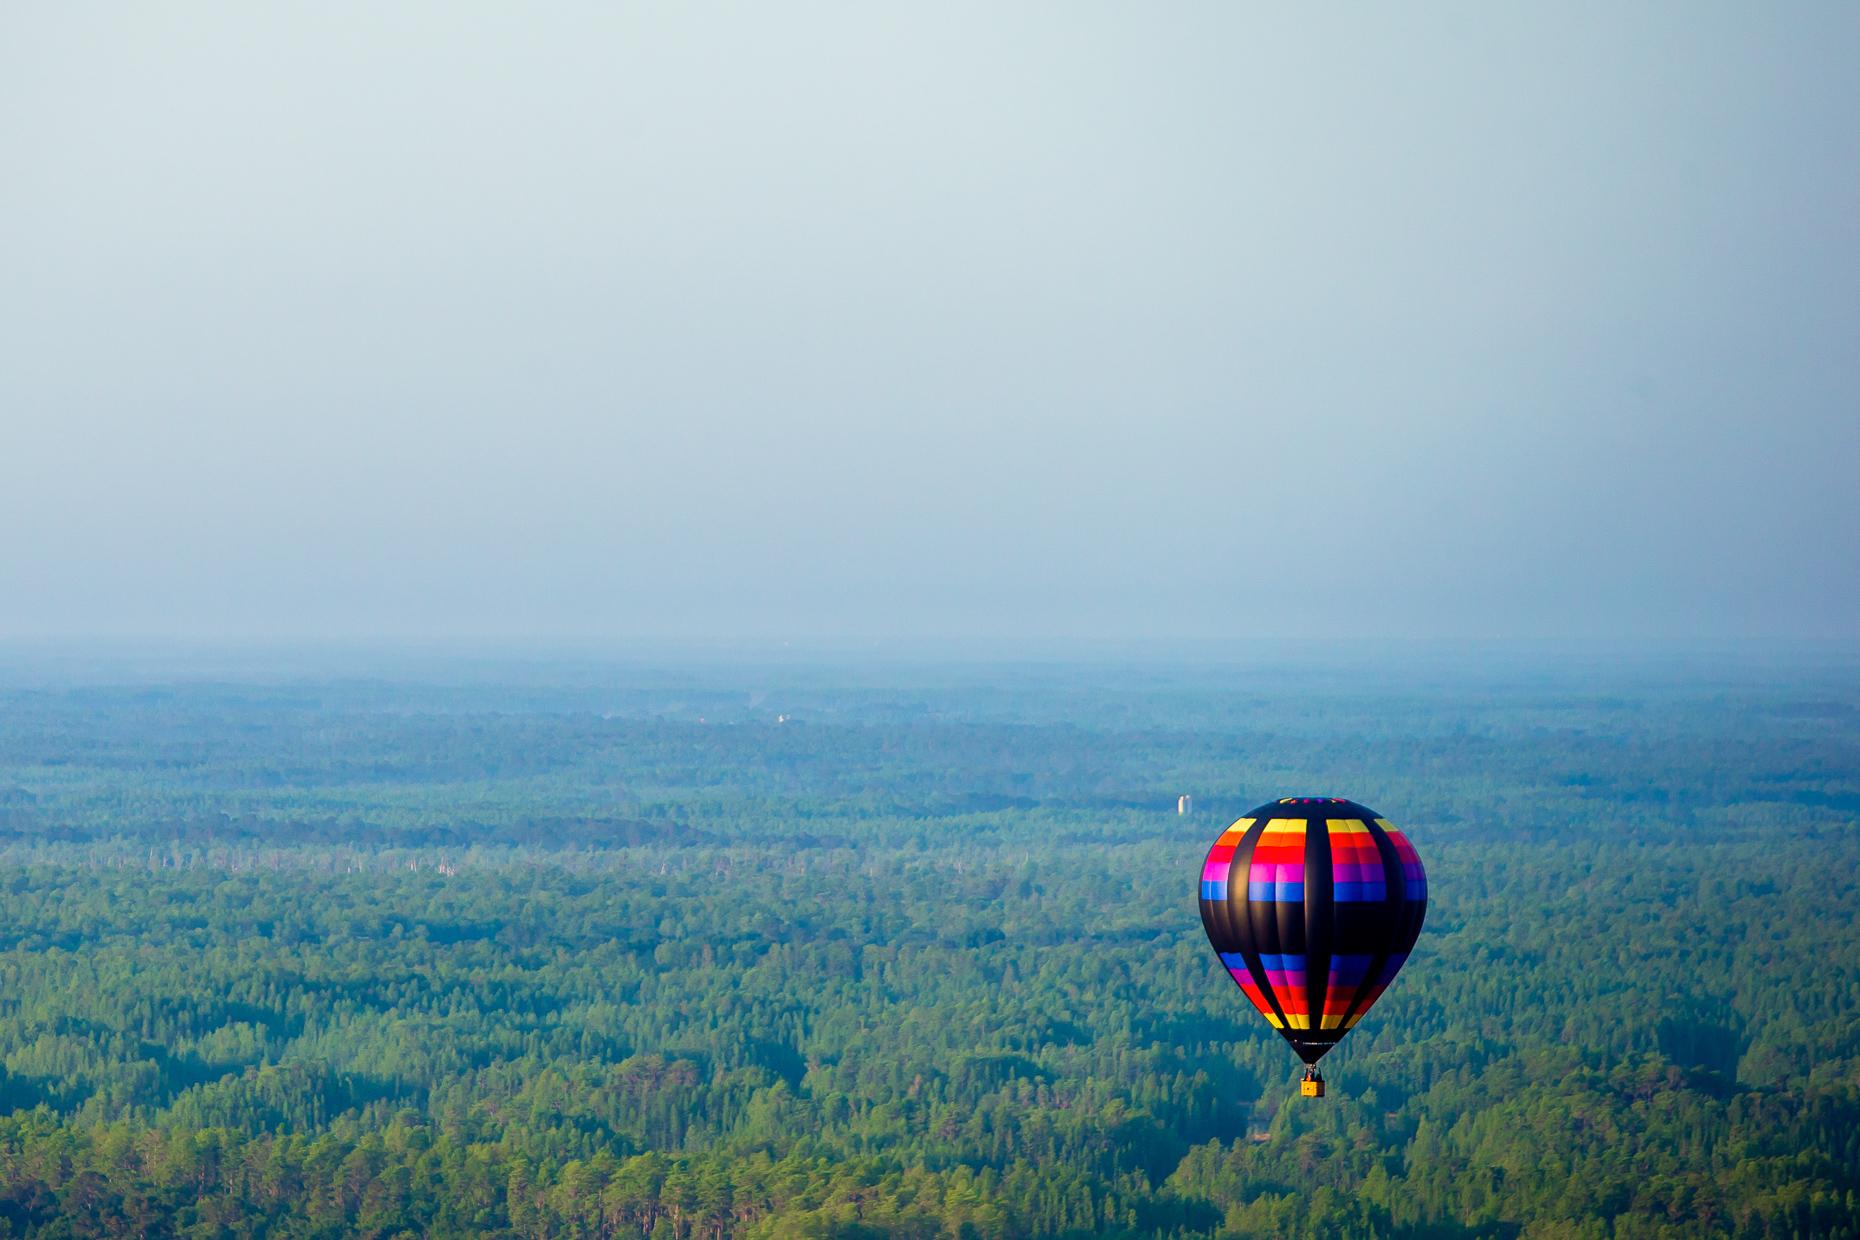 hot air balloon lock and land chip litherland orlando 0016.JPG